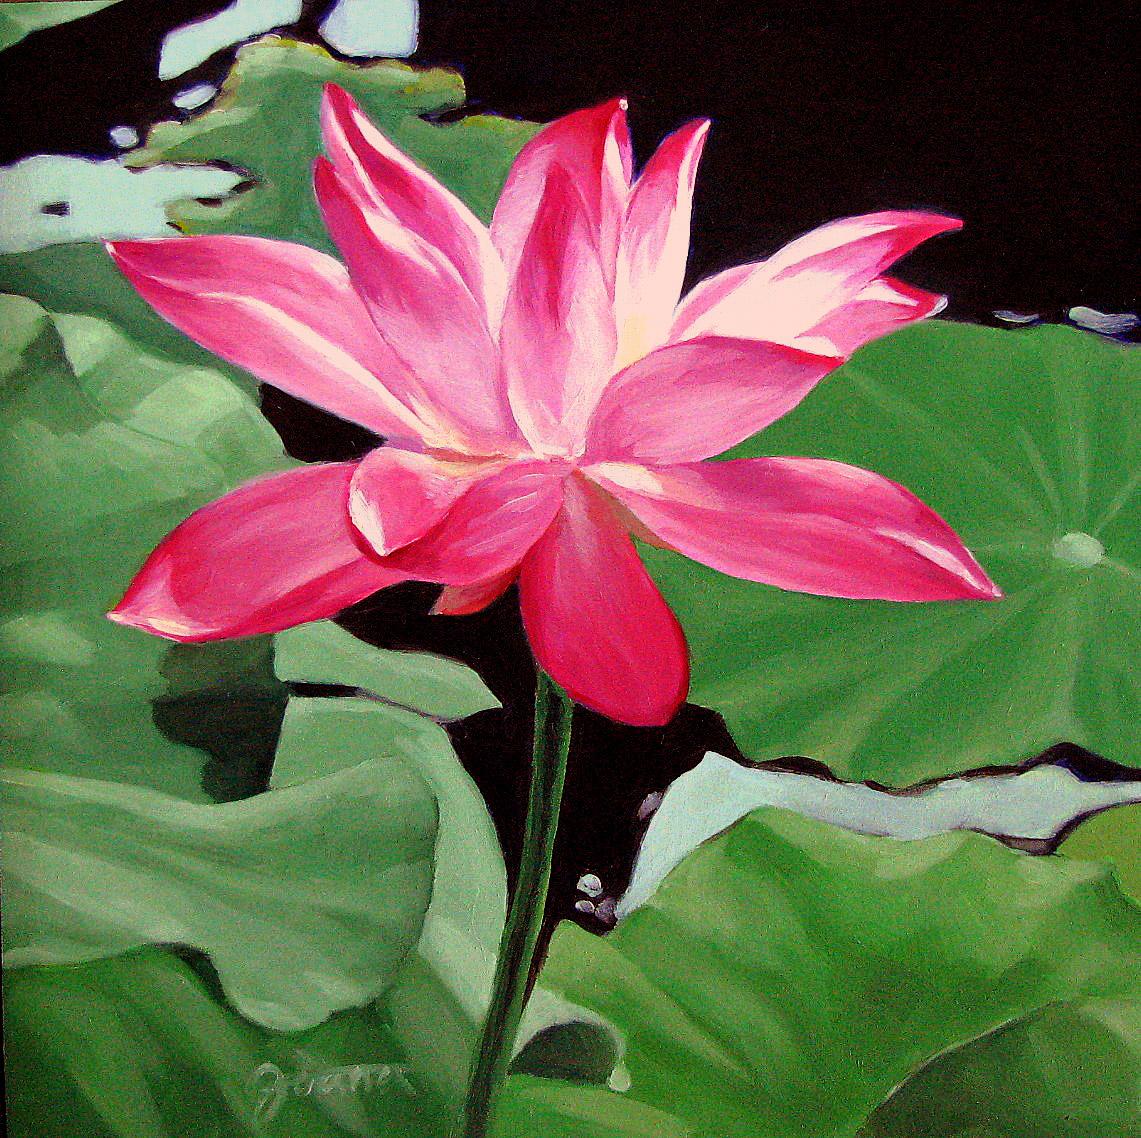 """Pink Water lily"" original fine art by Joanna Bingham"